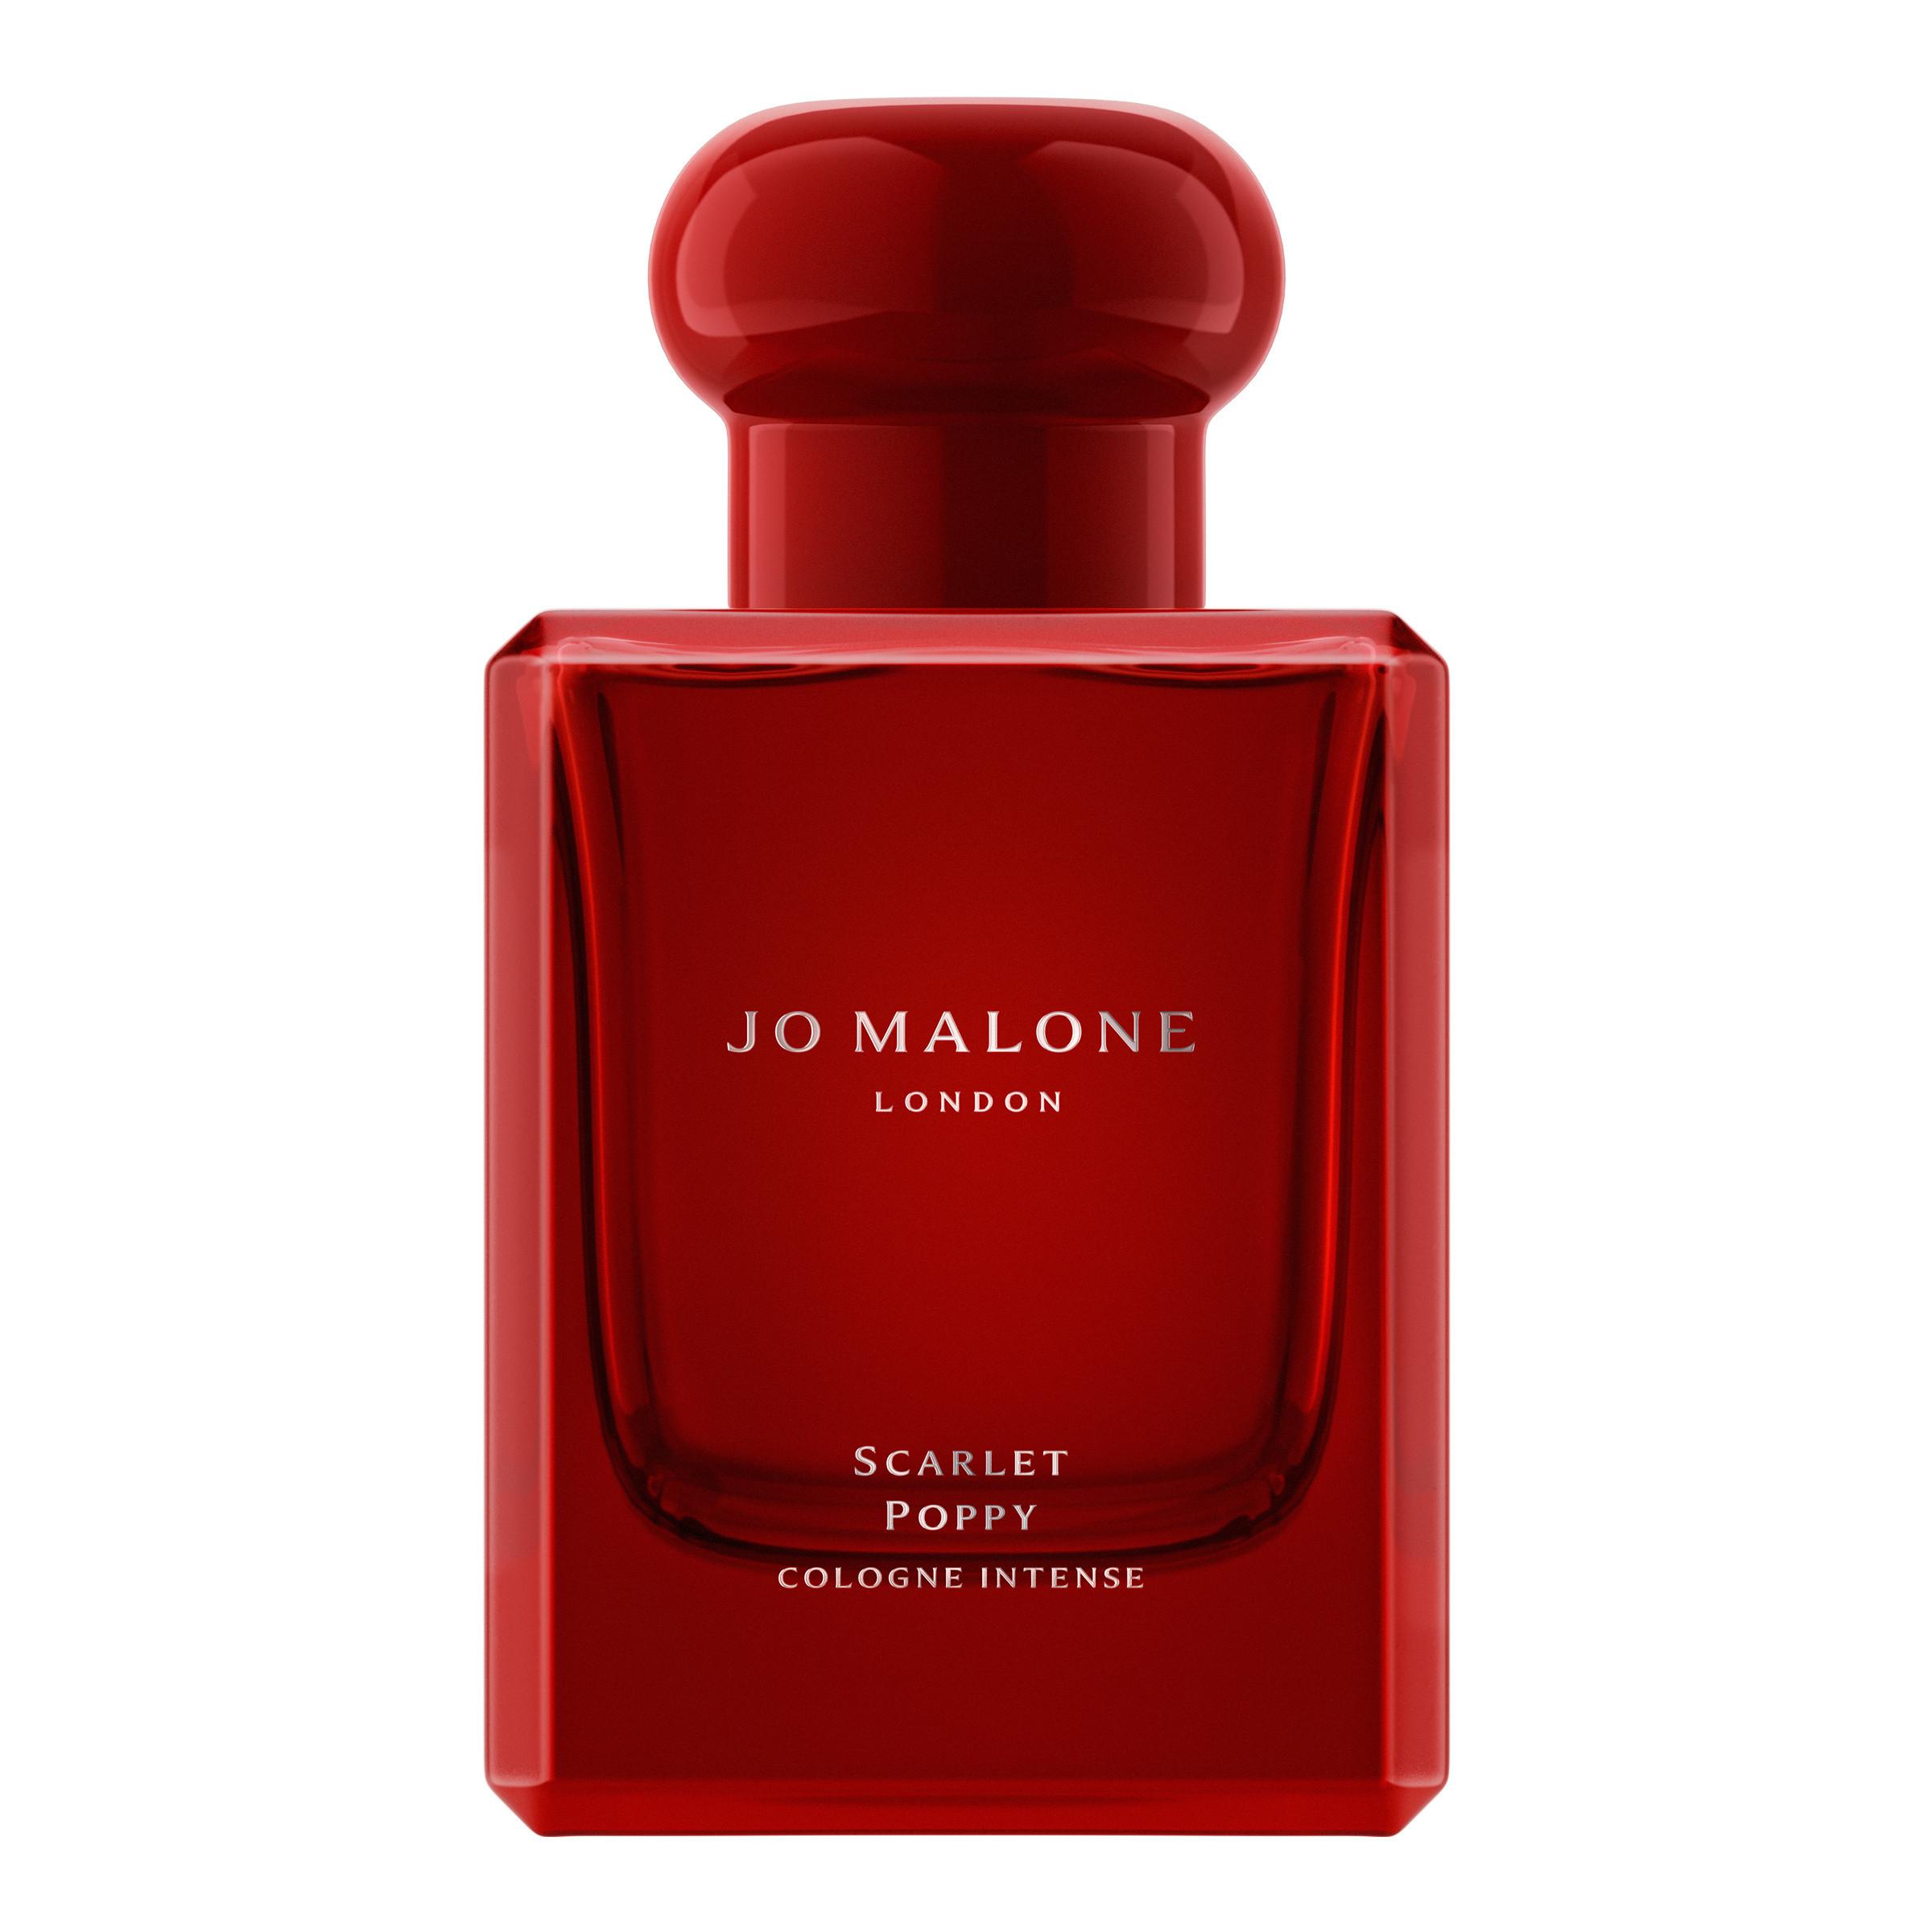 Jo Malone London scarlet poppy cologne intense 50 ml, Beige, large image number 0